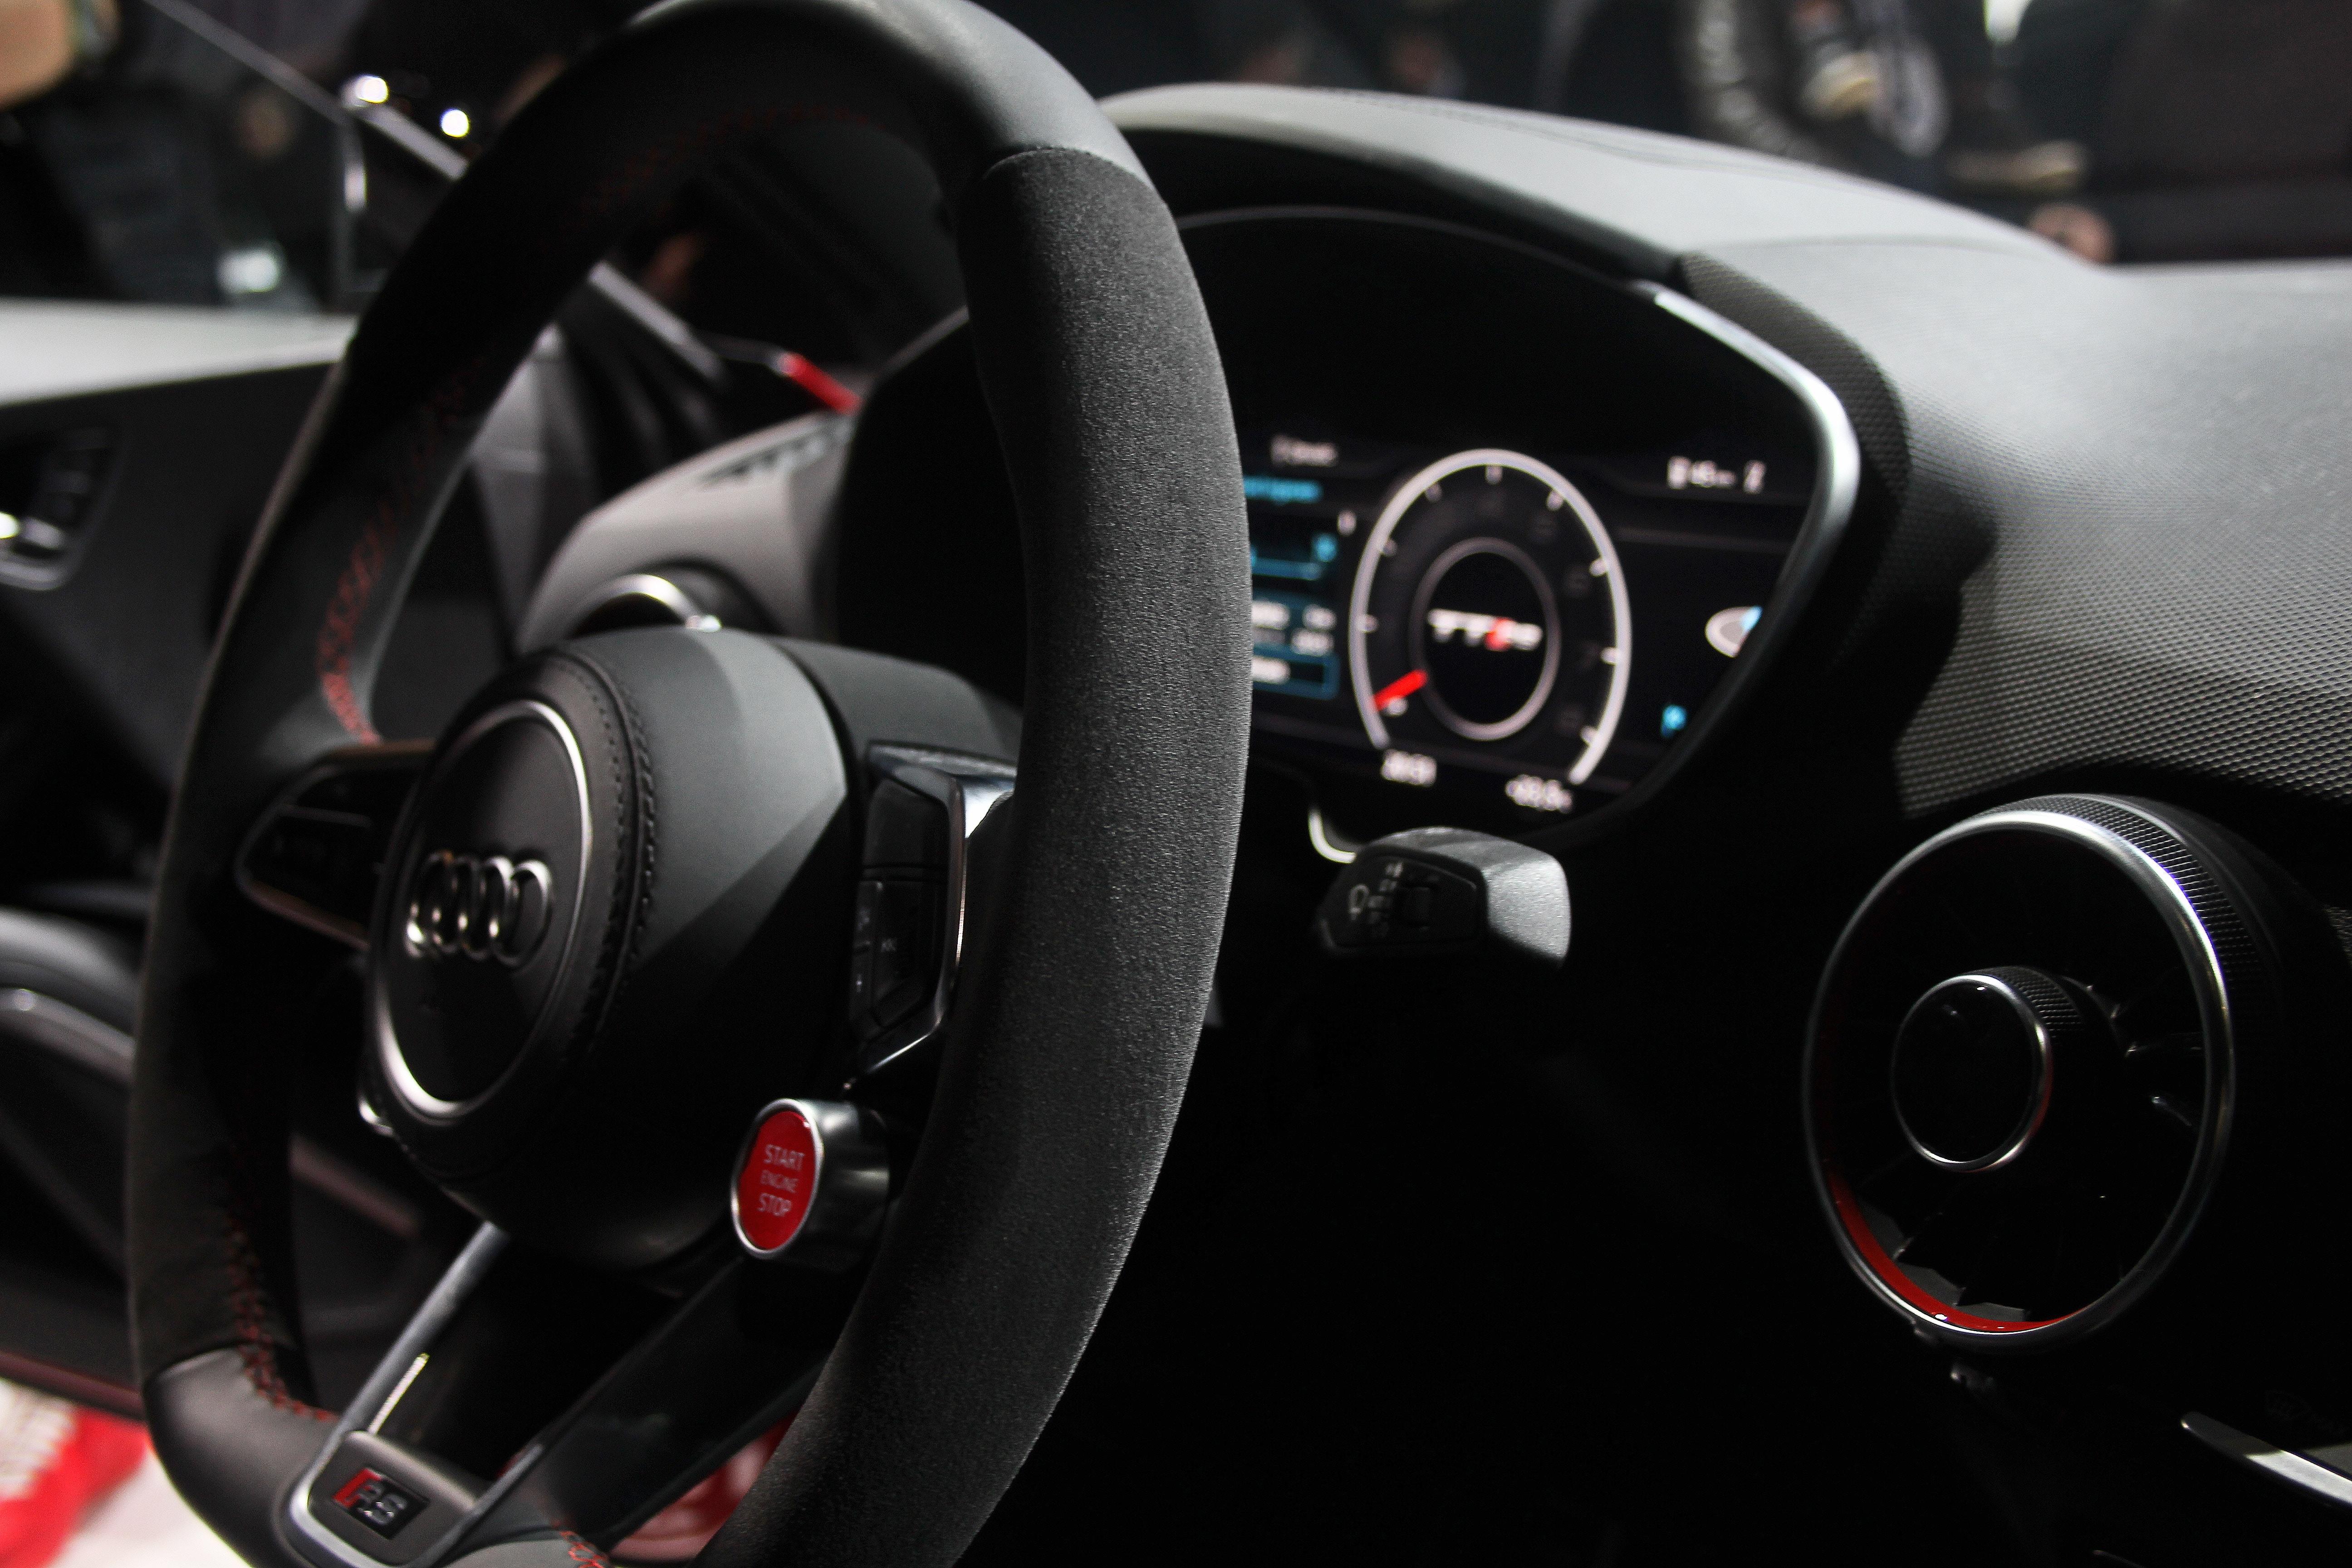 Fahrzeugtechnik im Cockpit – Hightech pur